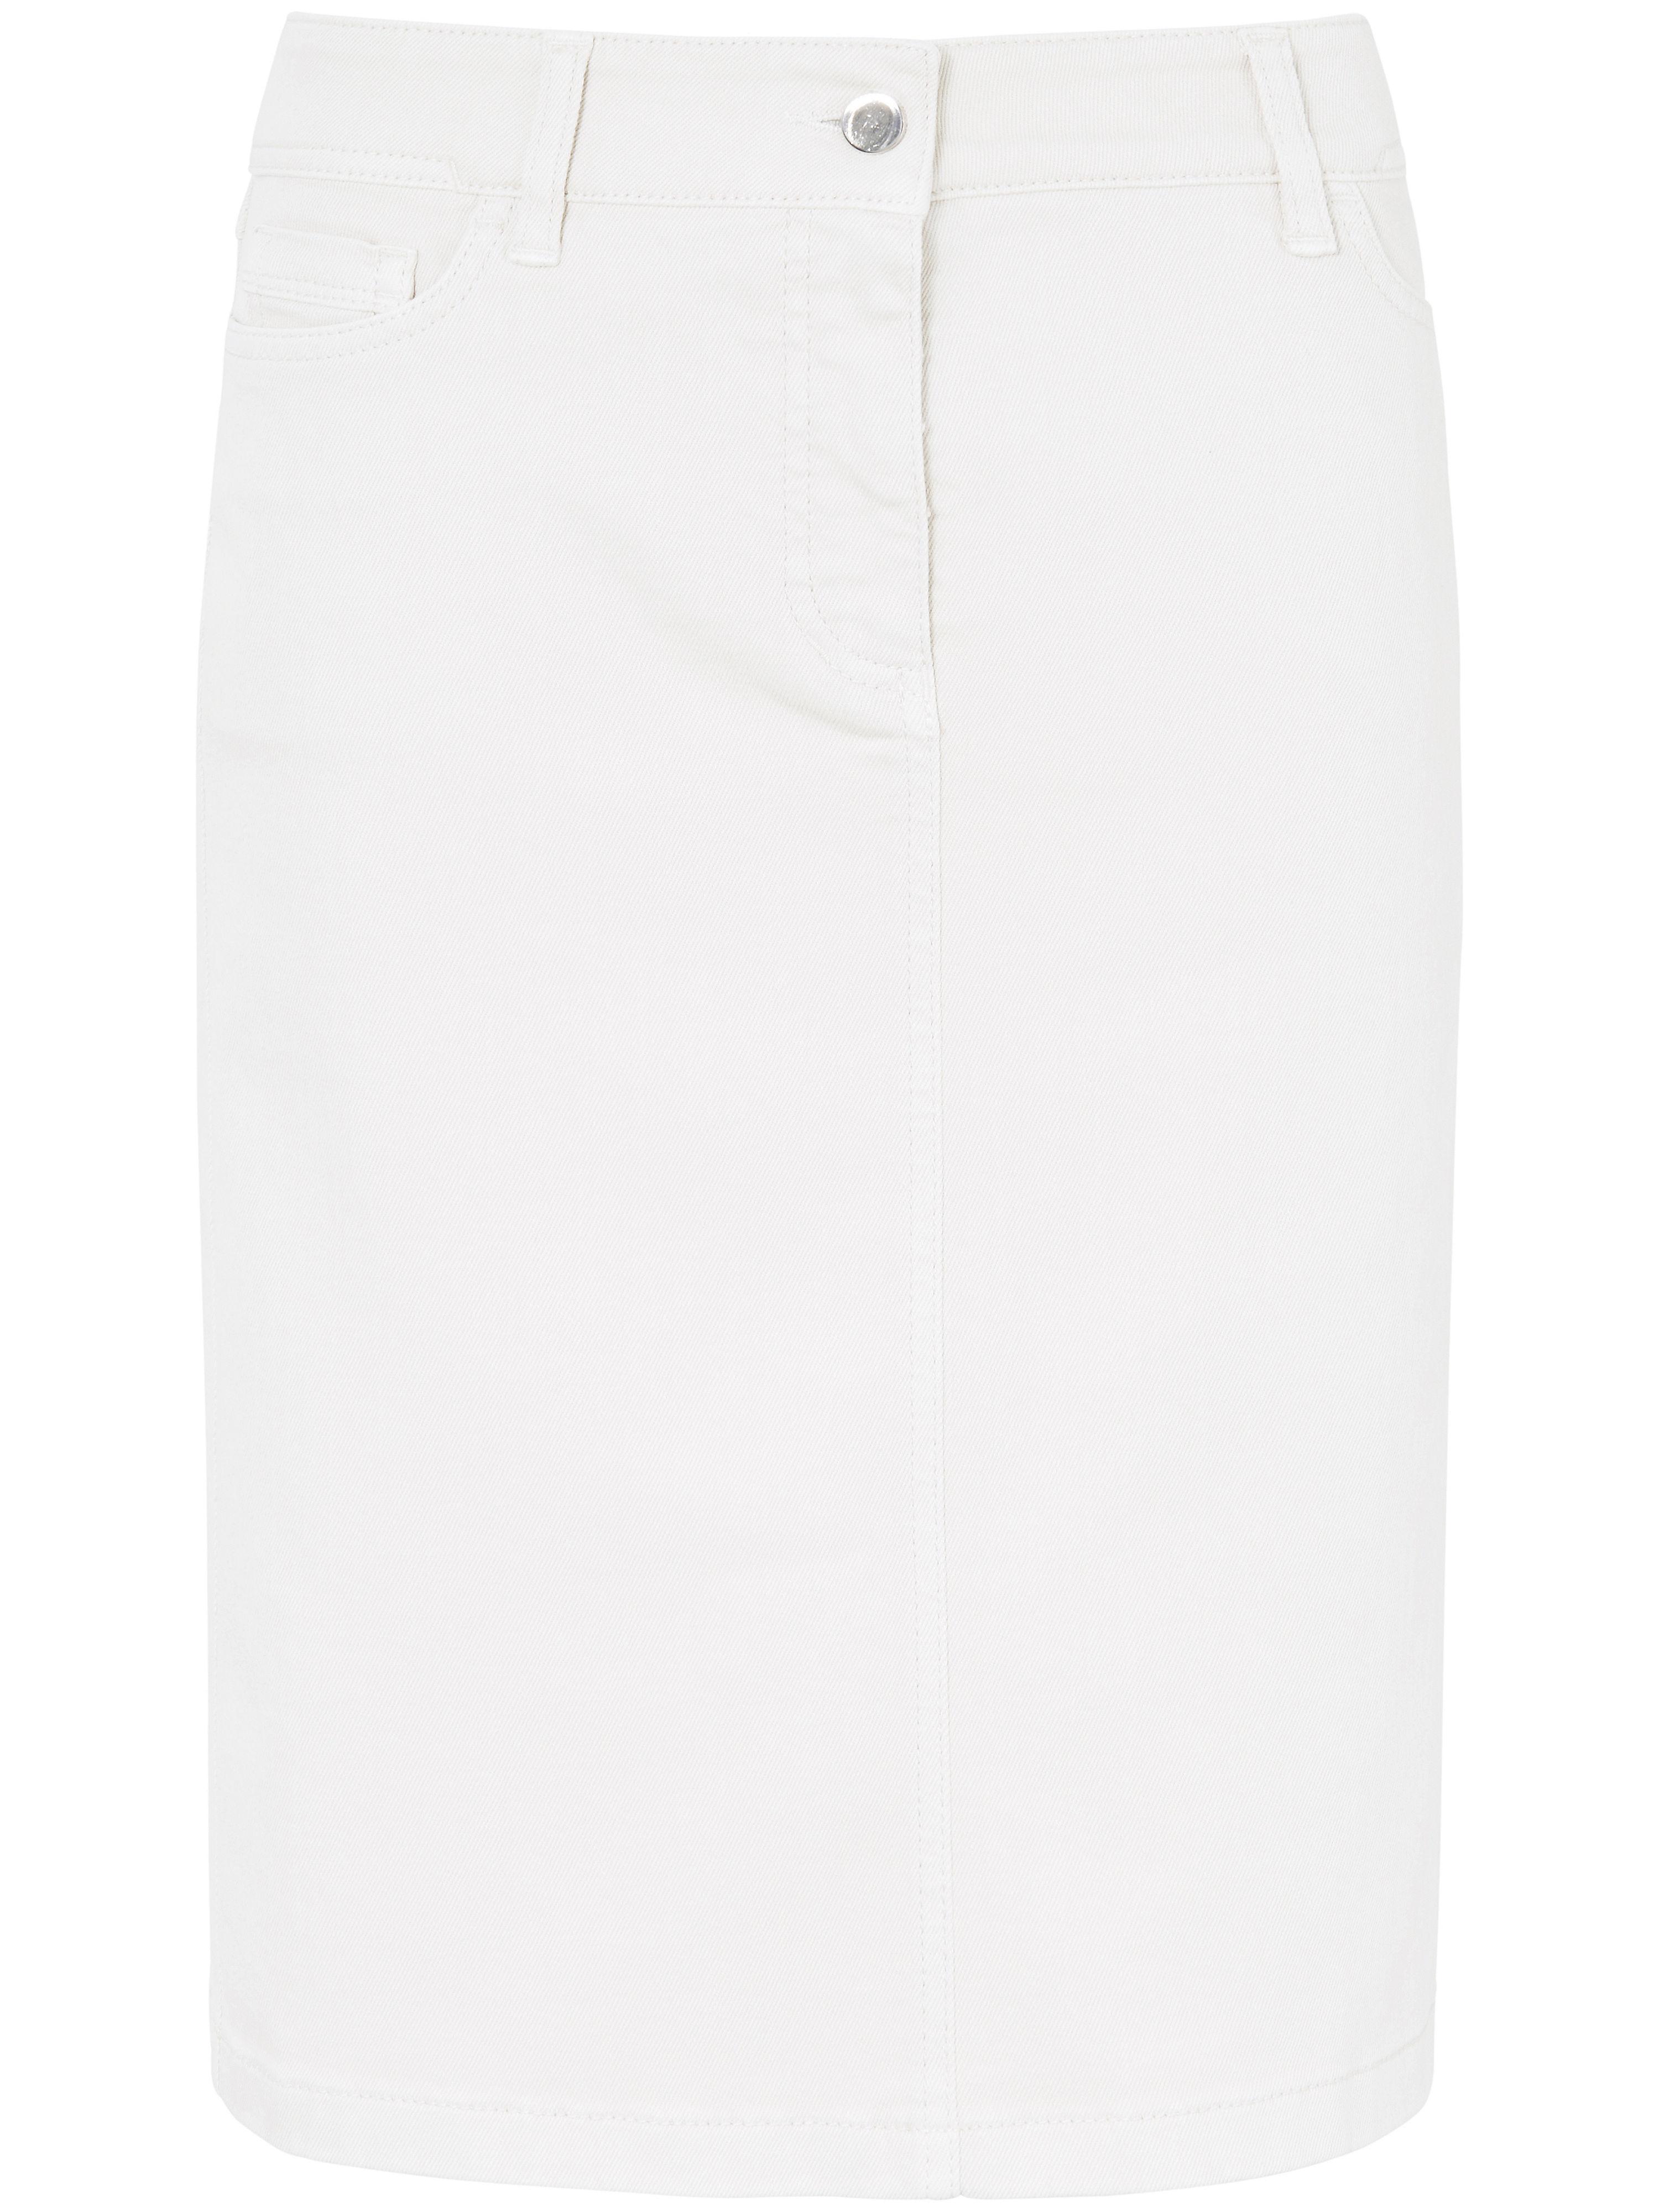 La jupe jean  DAY.LIKE blanc taille 20